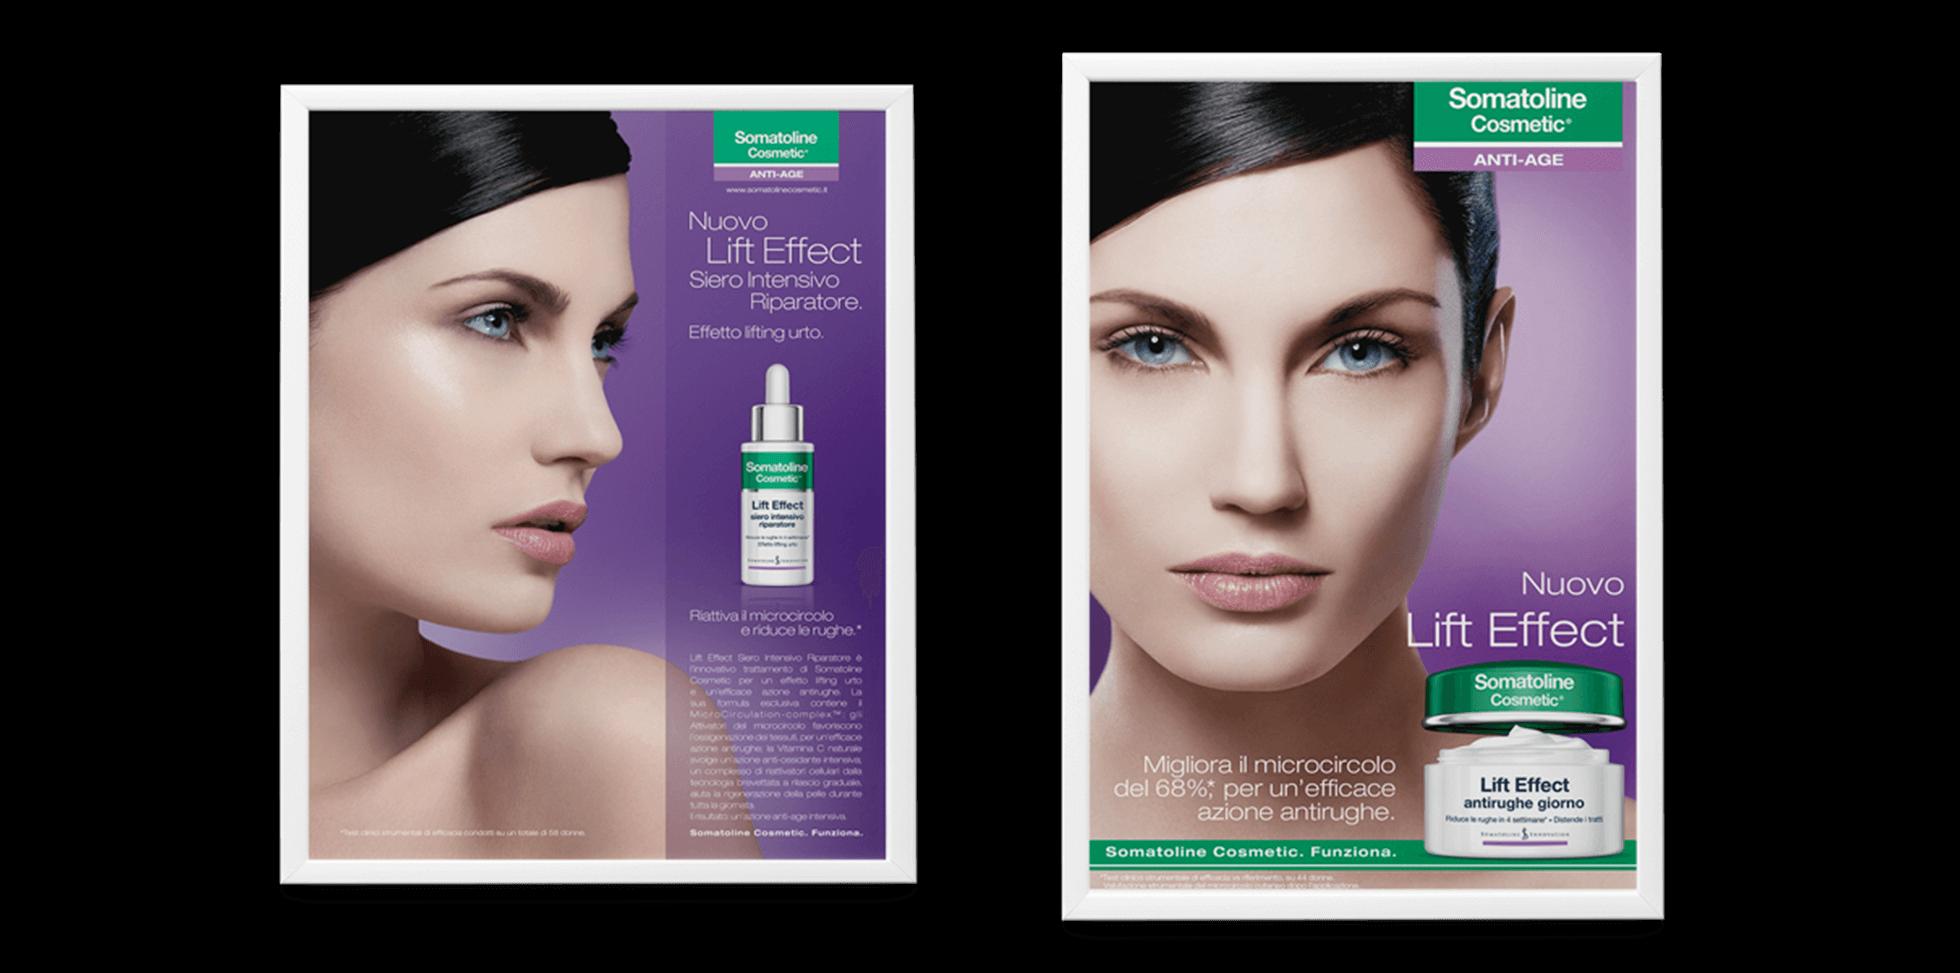 Somatoline Cosmetic Print Advert